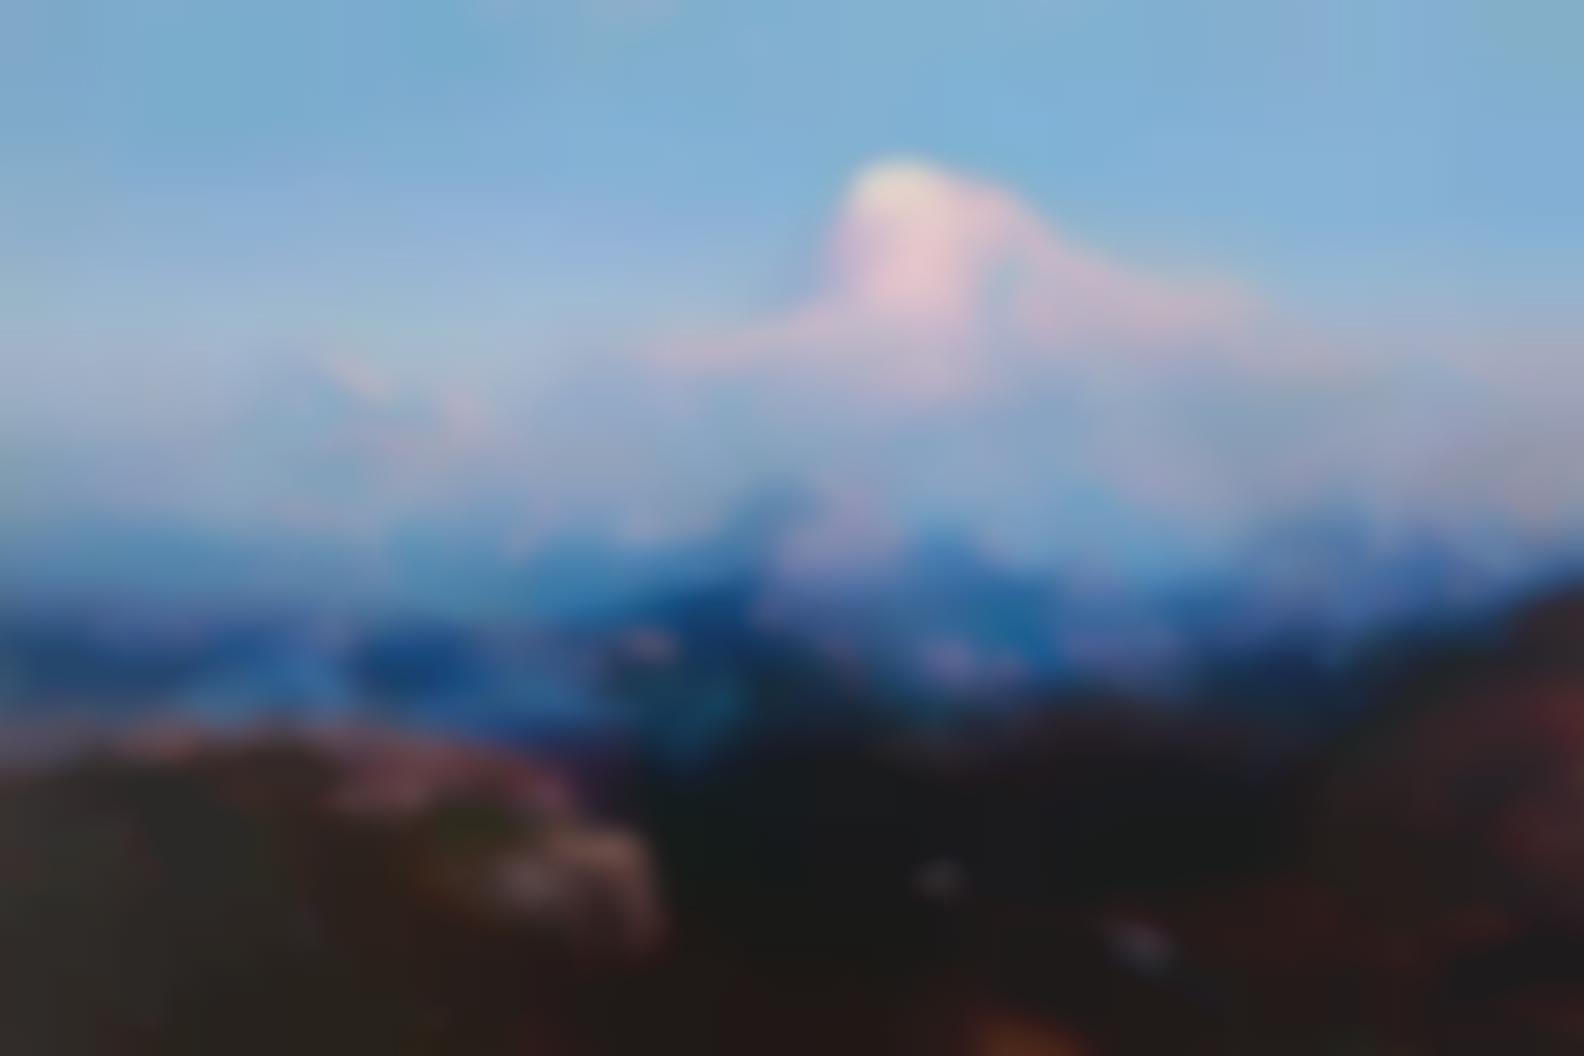 Sydney Laurence - Mount Mckinley, 63° North Latitude, Alaska, Altitude 20.390 Feet-1912